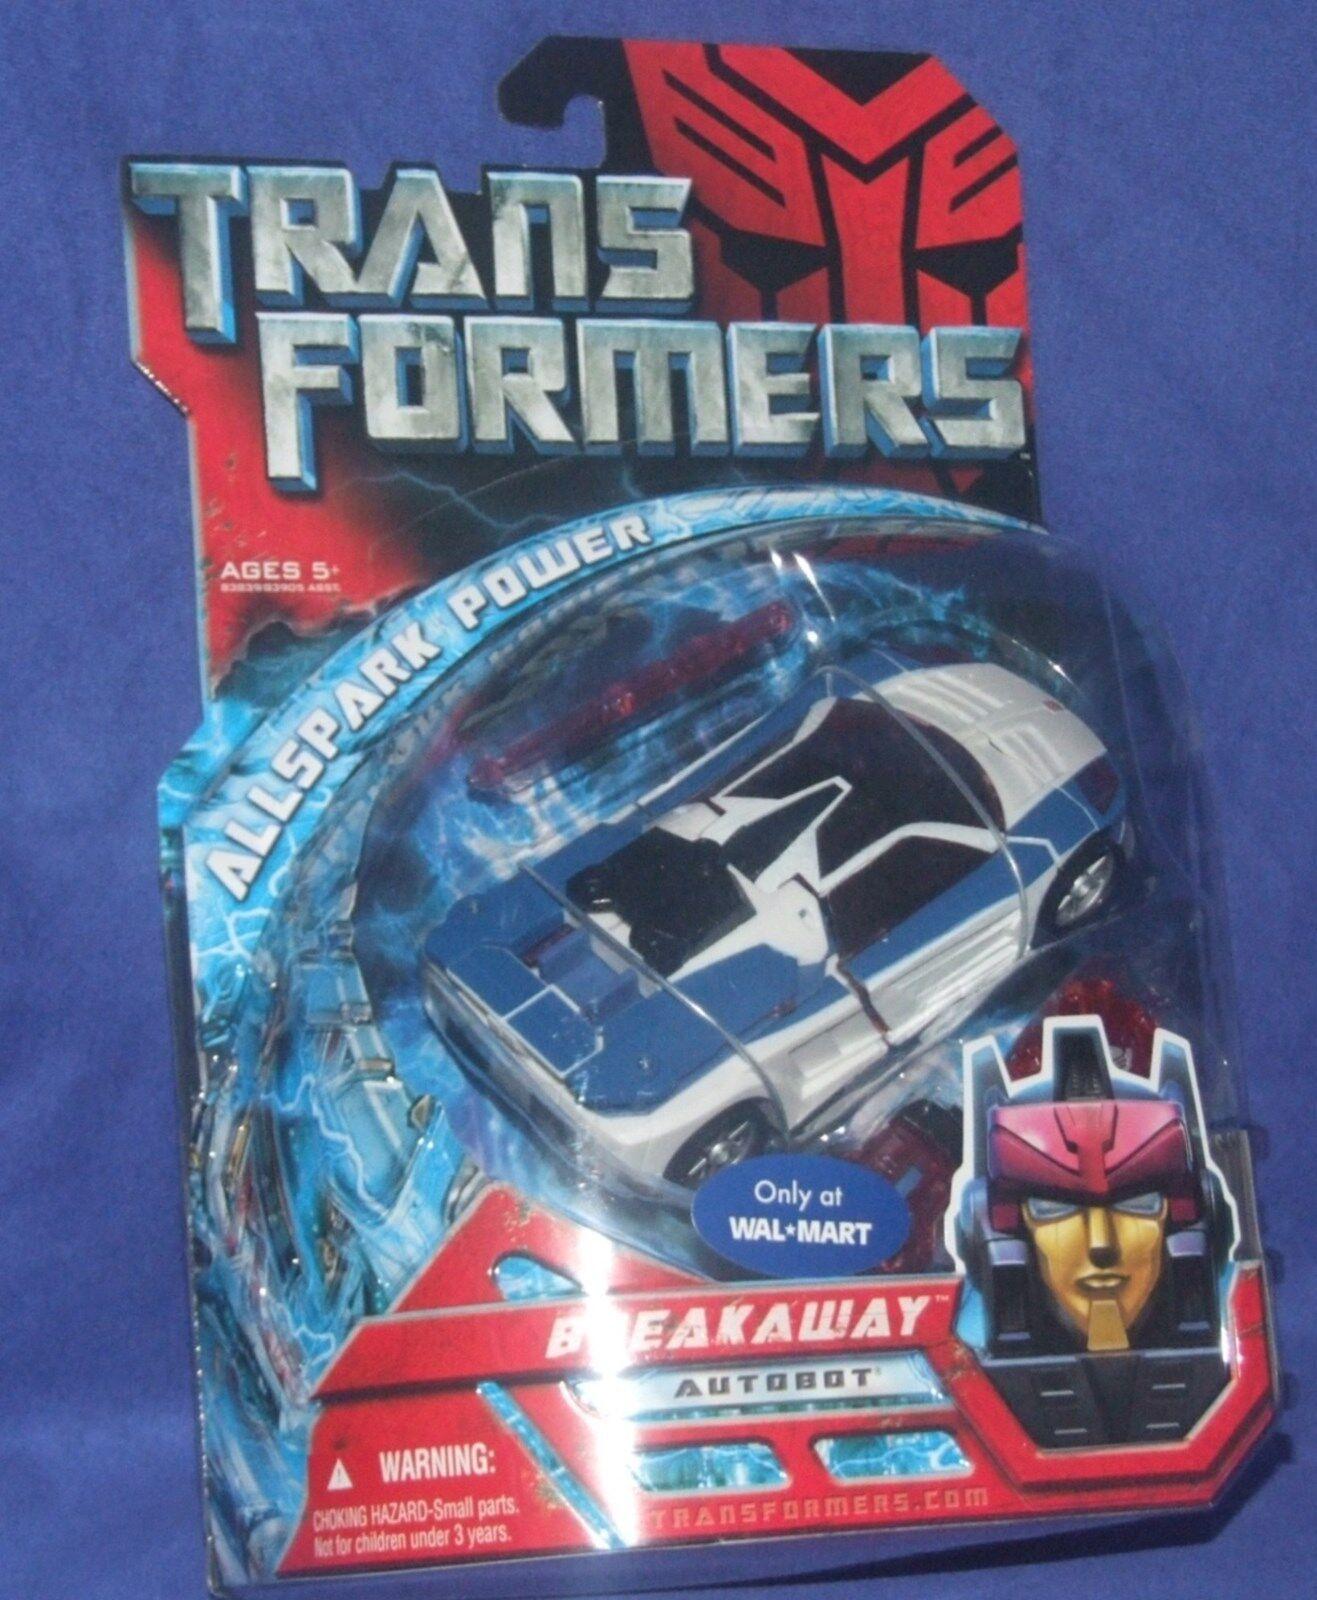 Transformers Movie Deluxe Class WALMART EXCLUSIVE Autobot Breakaway 2008  NEUF  autorisation de vente de la marque